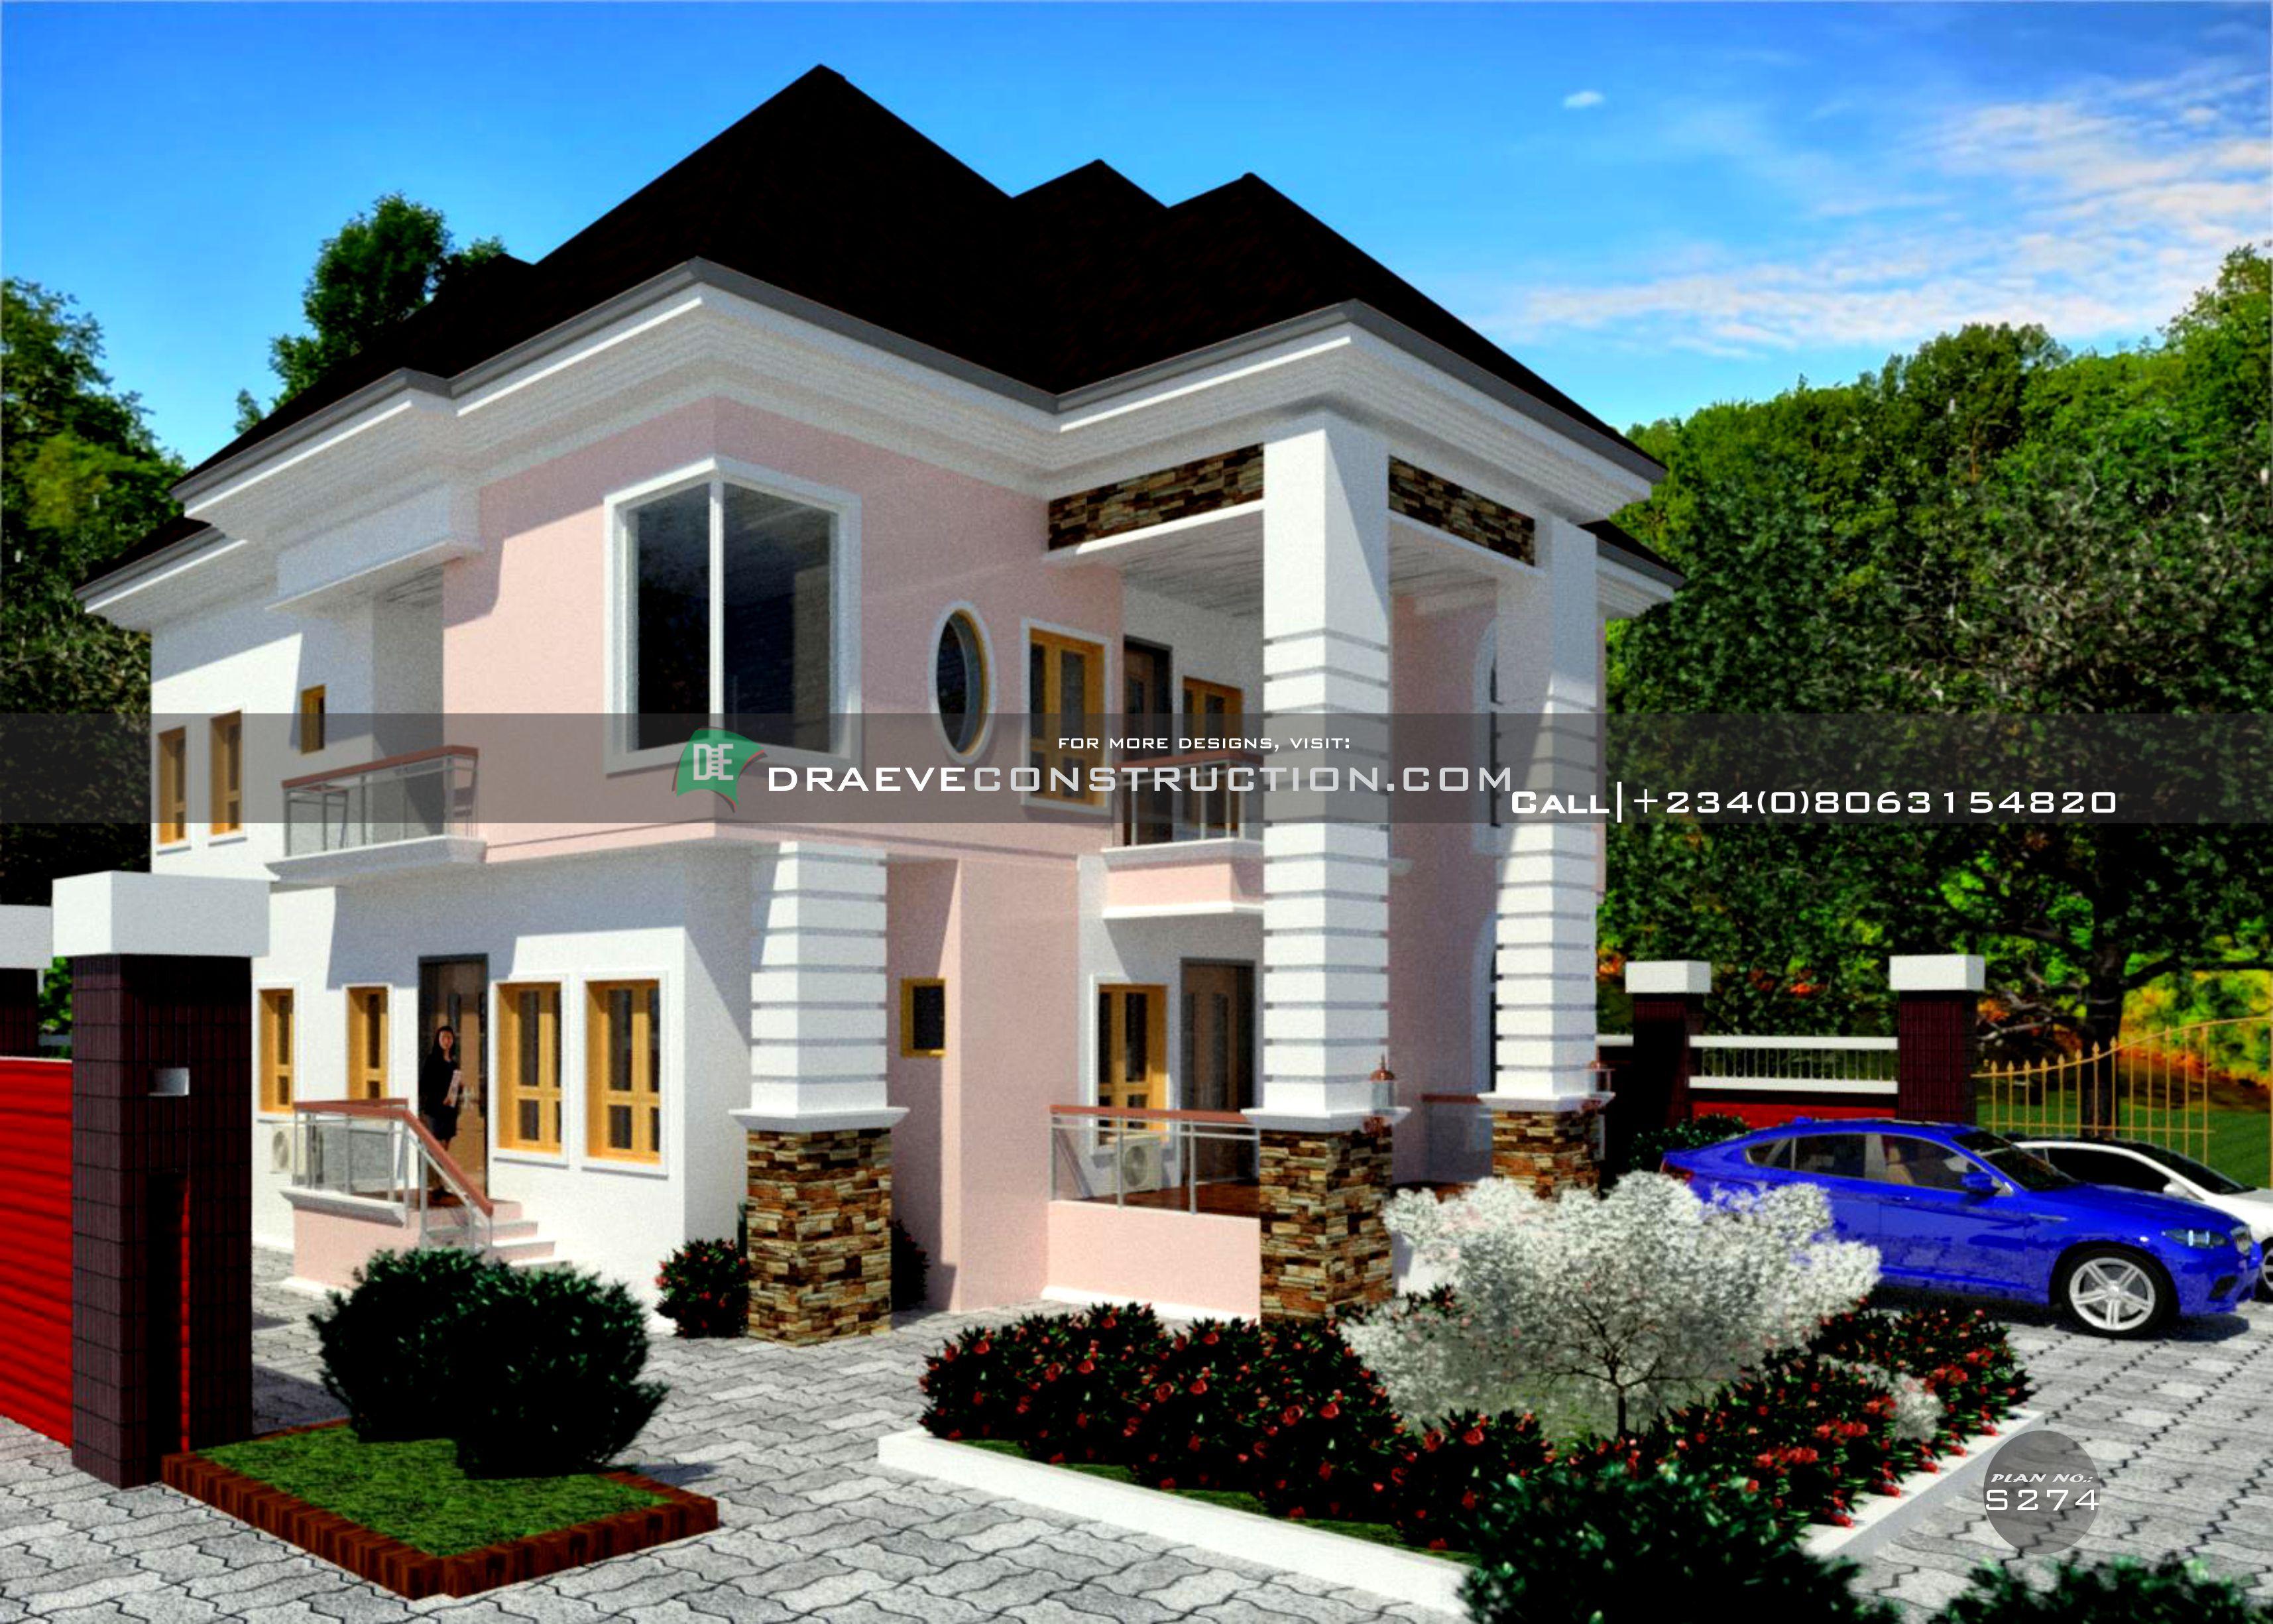 3 Bedroom Duplex Houseplan With A 1 Bedroom Flat In 2020 Duplex Design Building House Plans Designs Home Design Plans